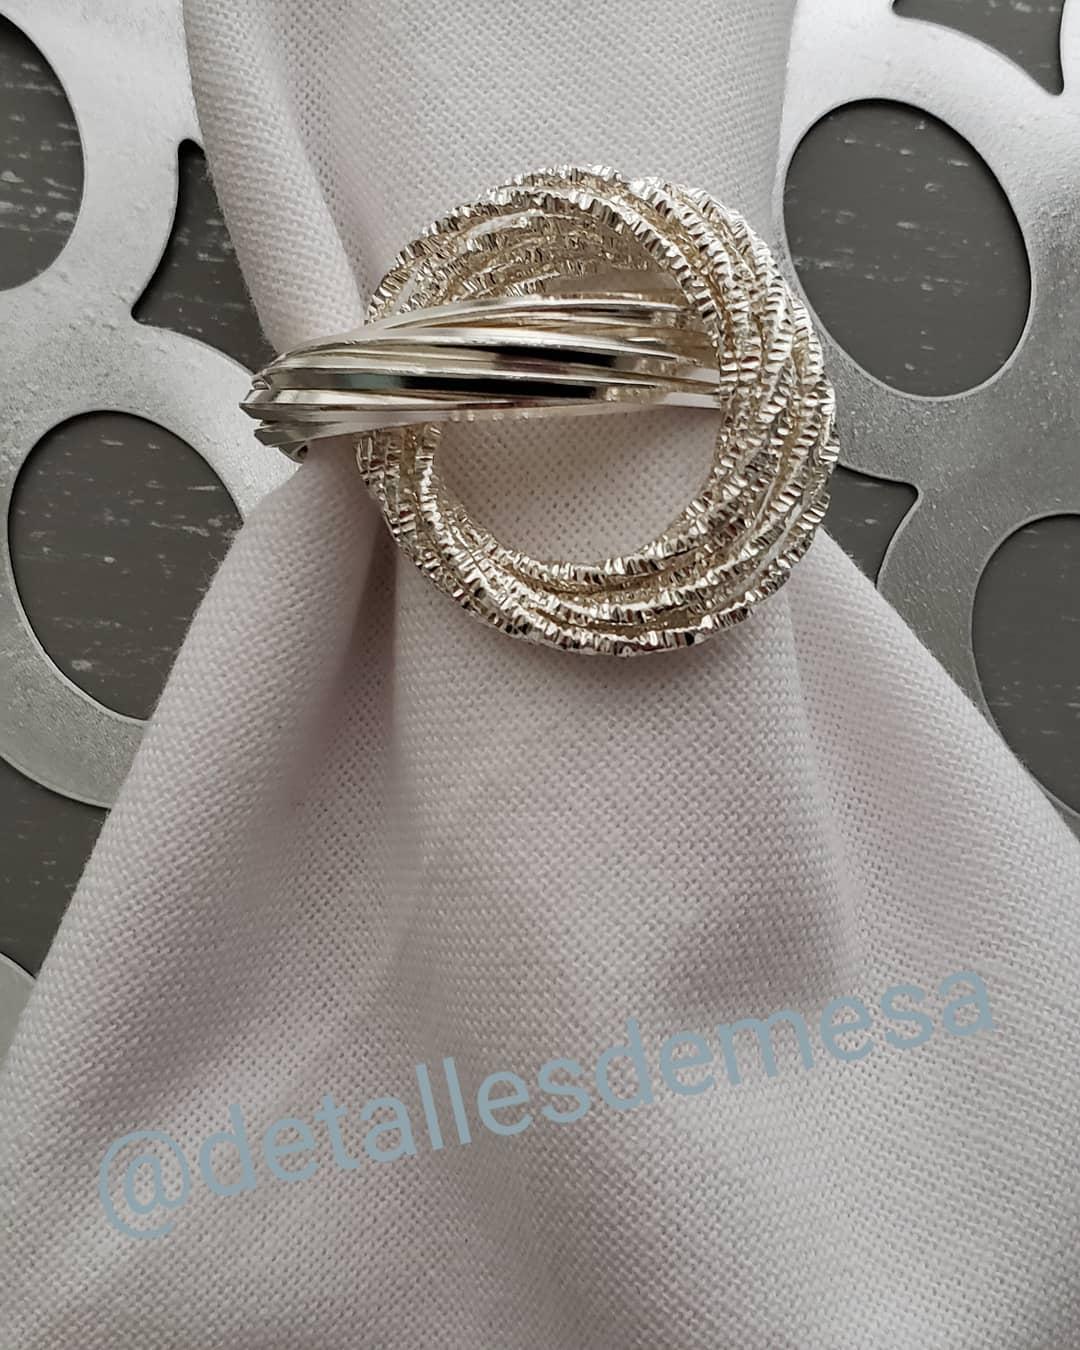 Beleza de porta-guardanapos de metal prateado. #portaservilletas #serville ...